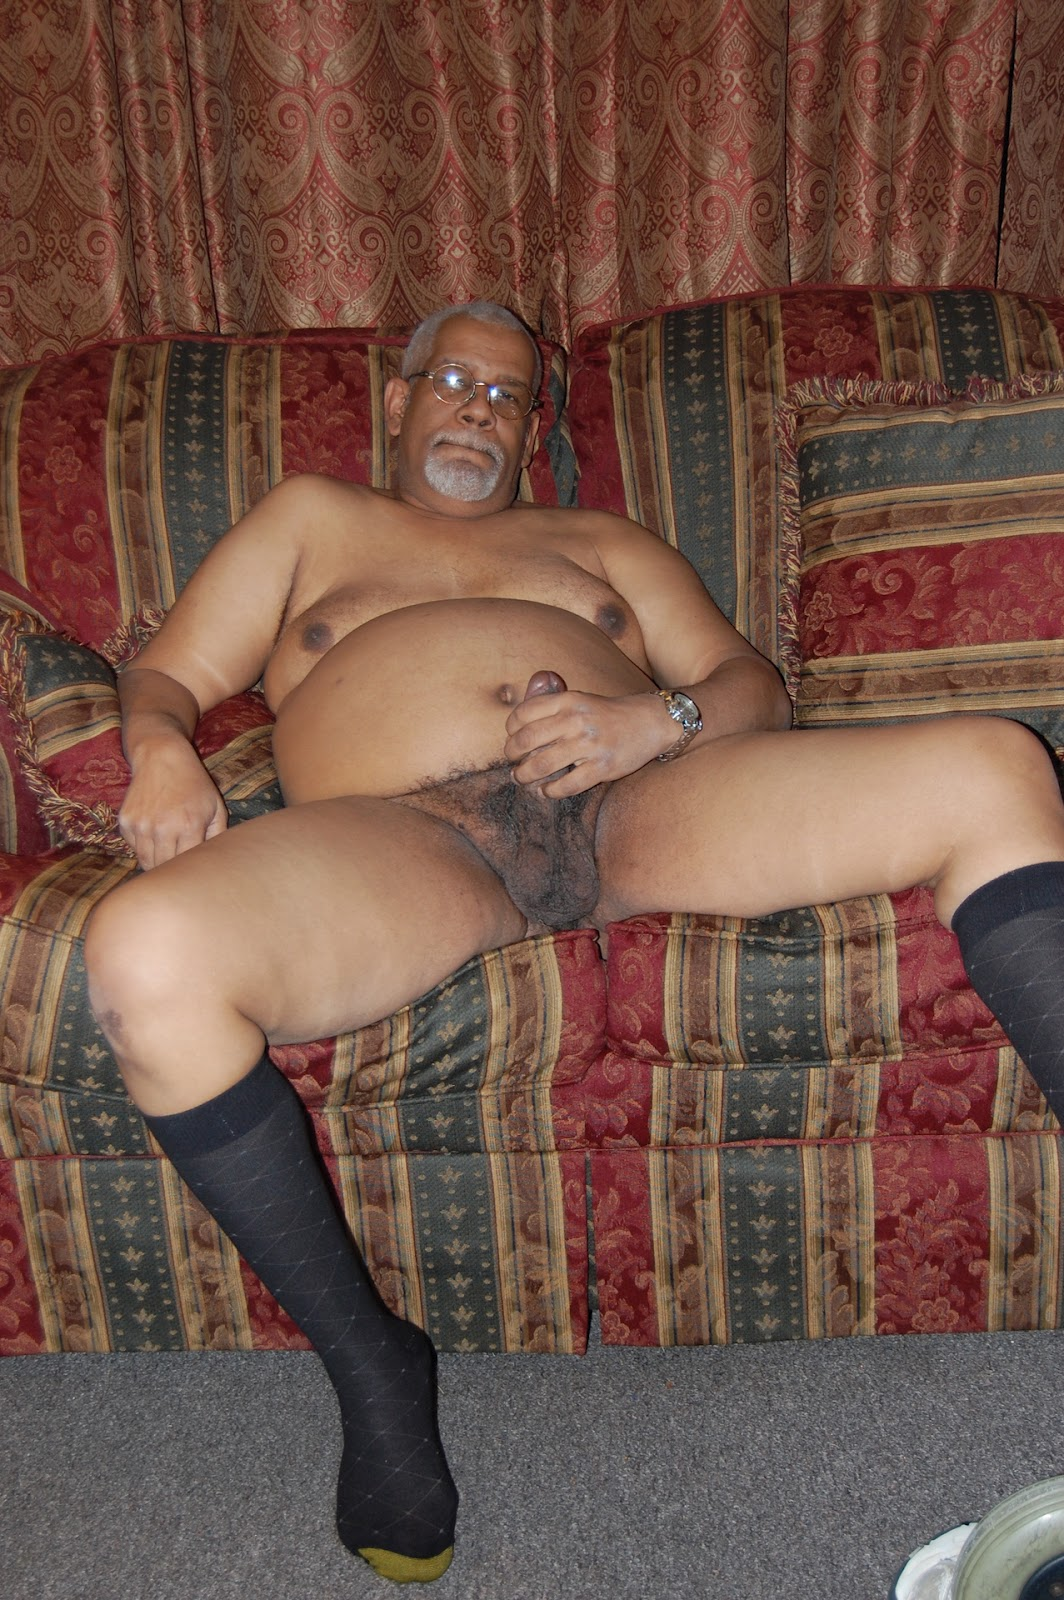 Mature Old Men Grandpa Naked